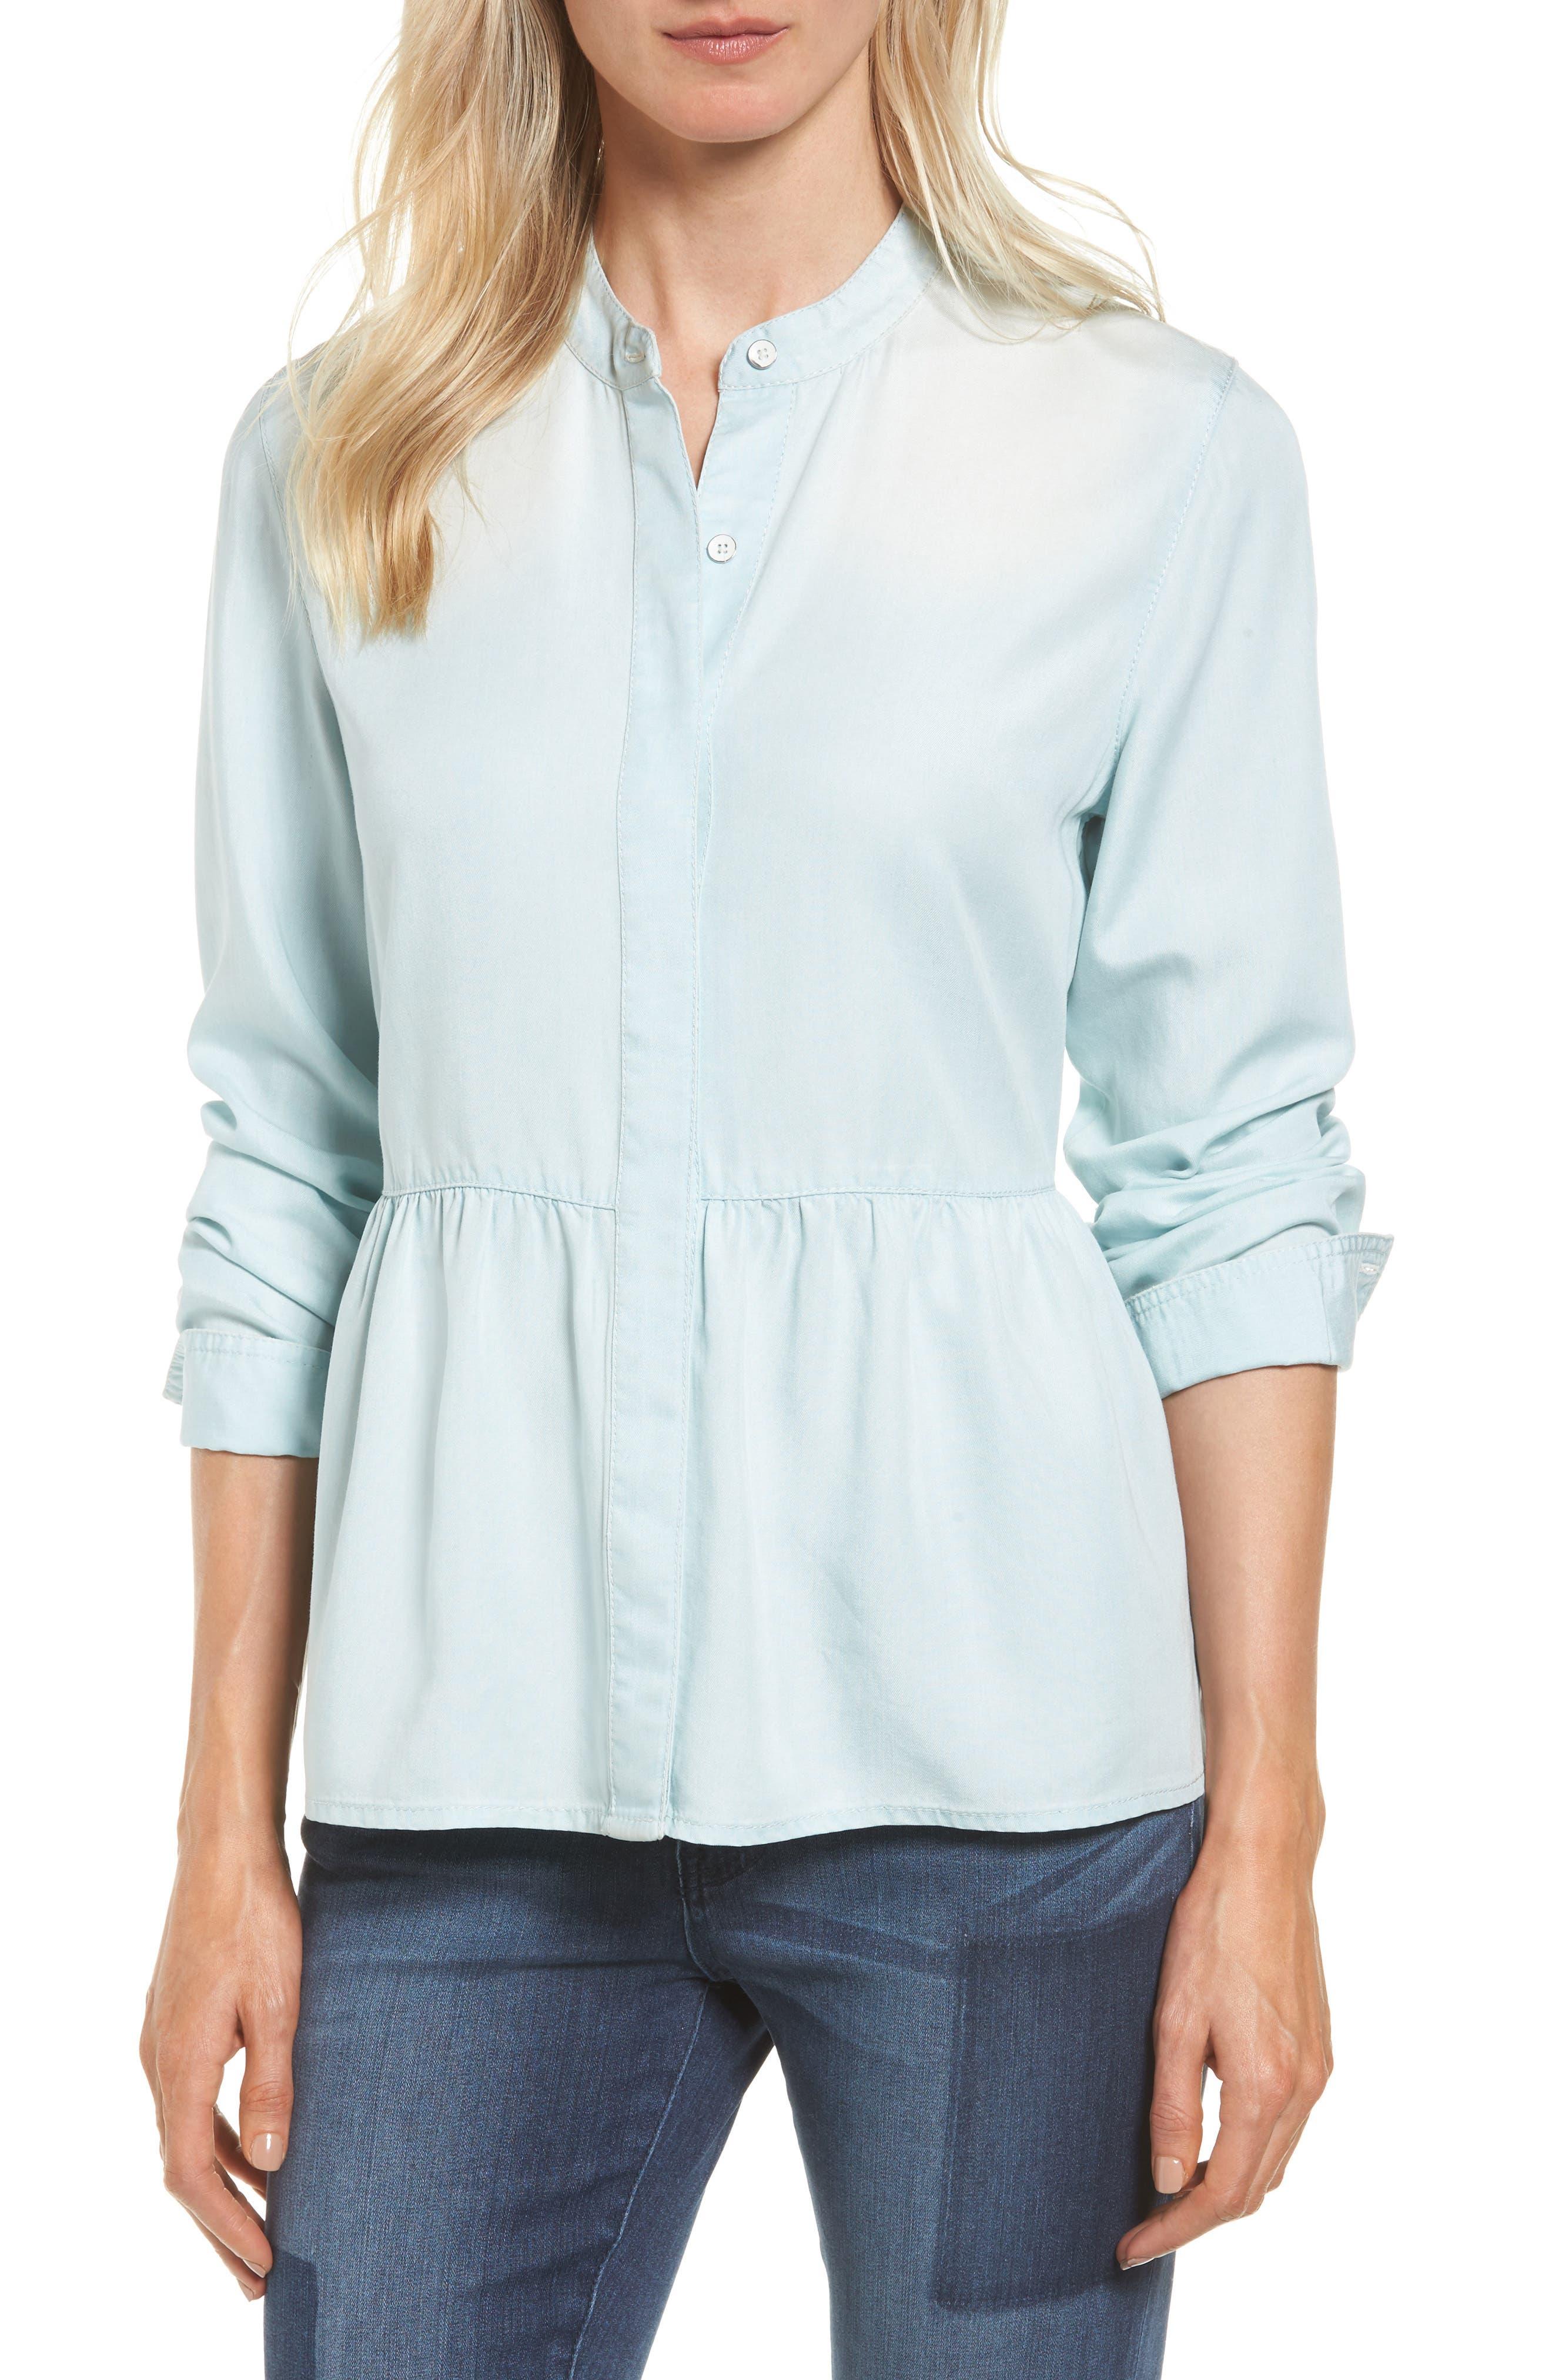 Alternate Image 1 Selected - Caslon® Peplum Shirt (Regular & Petite)